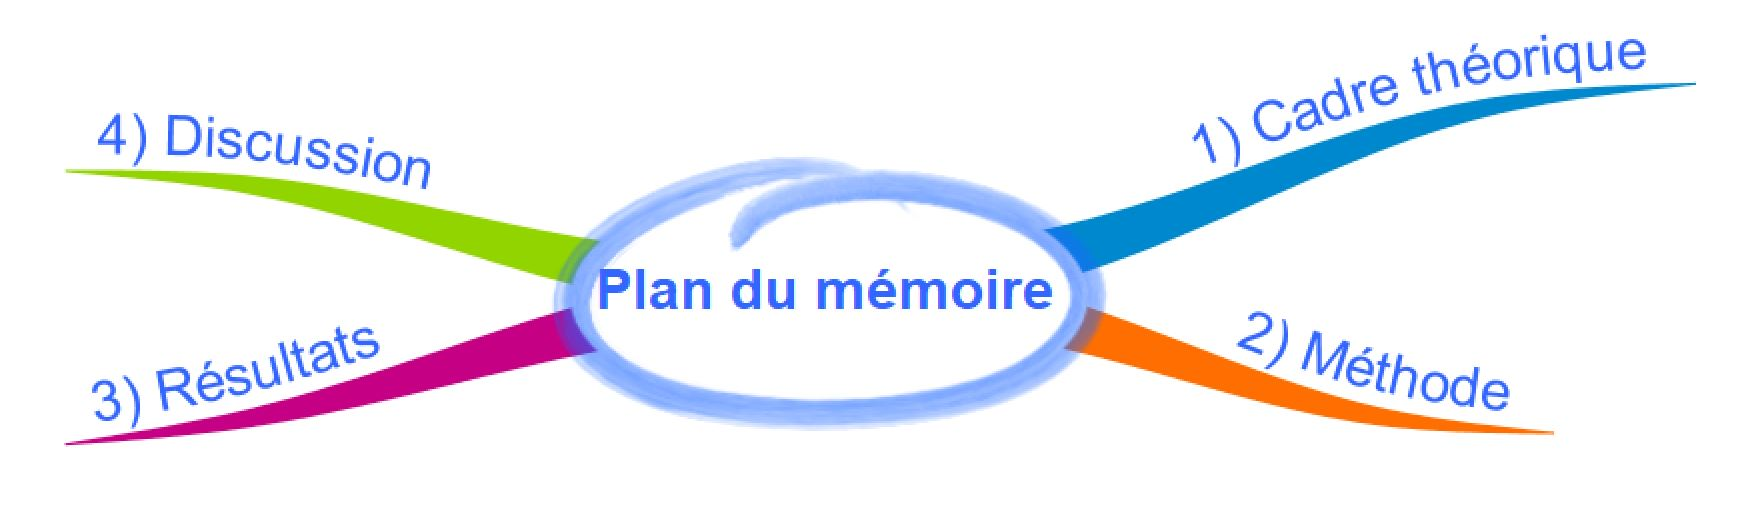 plan du memoire